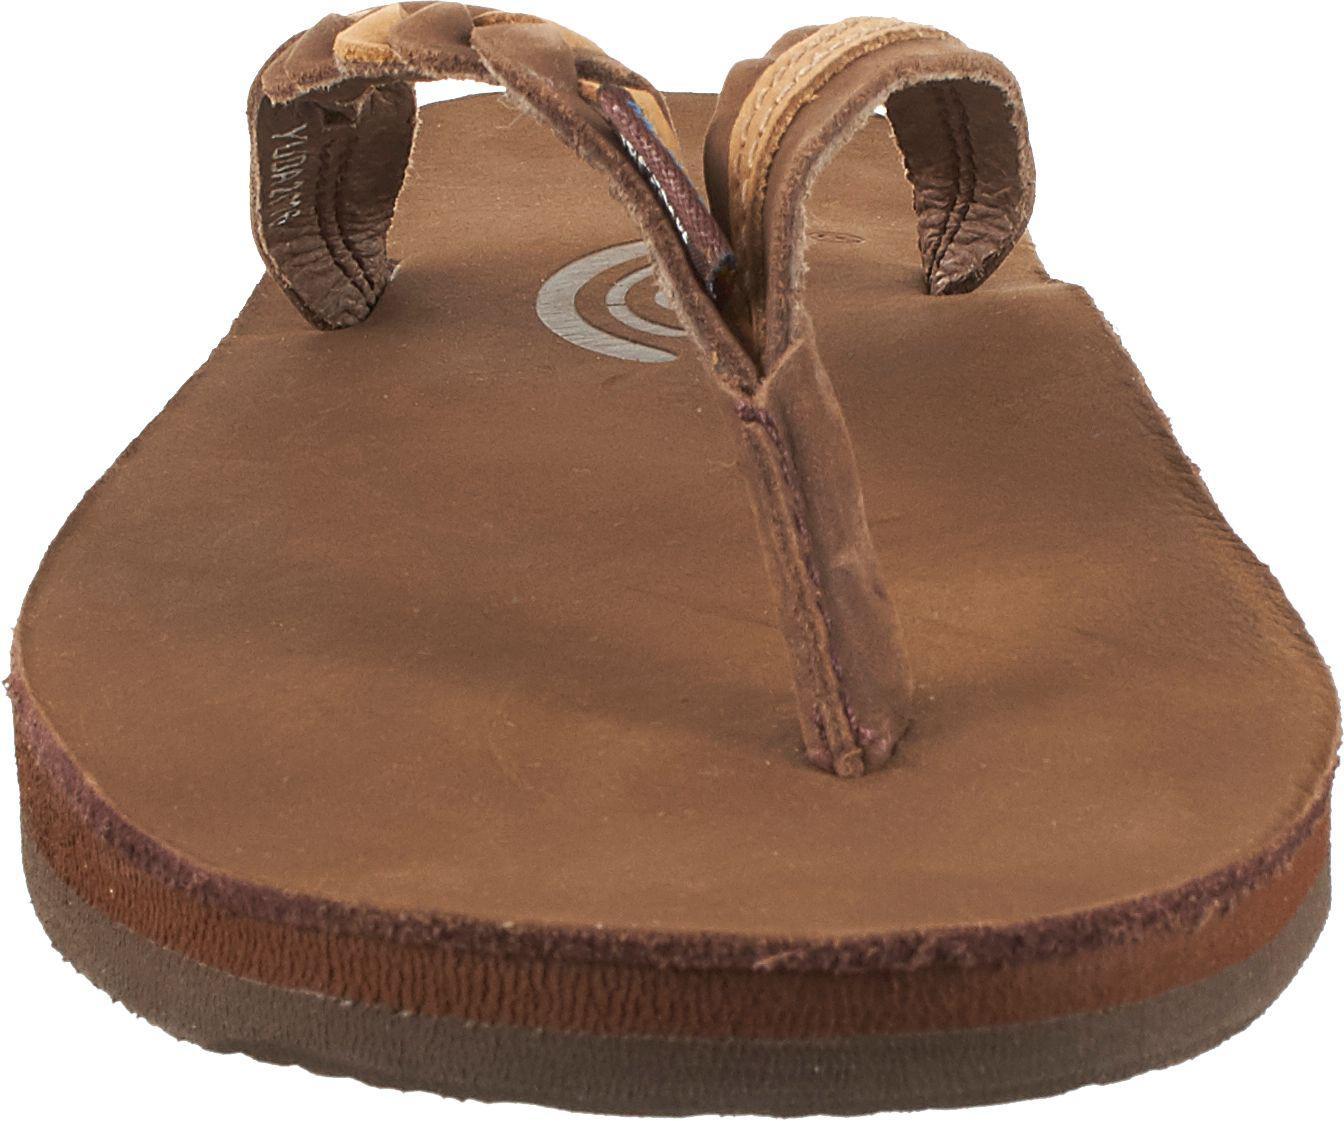 3fba9dba5 Rainbow Sandals - Brown Leather 301 Flirty Braid Twist Flip Flops - Lyst